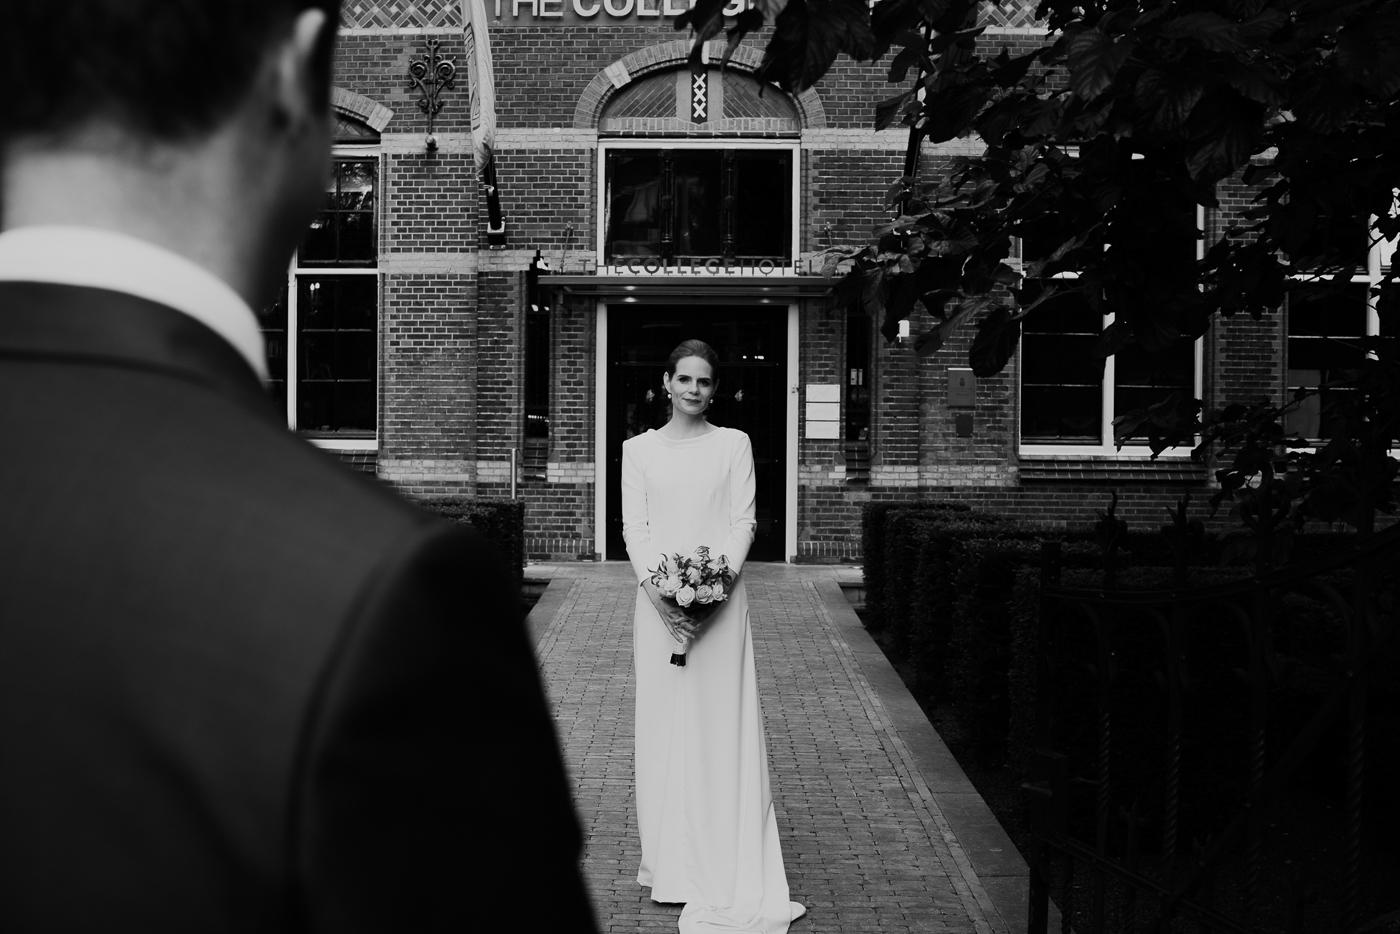 bruidsfotografie-trouwfotograaf-wedding-photographer-amsterdam-James-Jantine-270-2.jpg